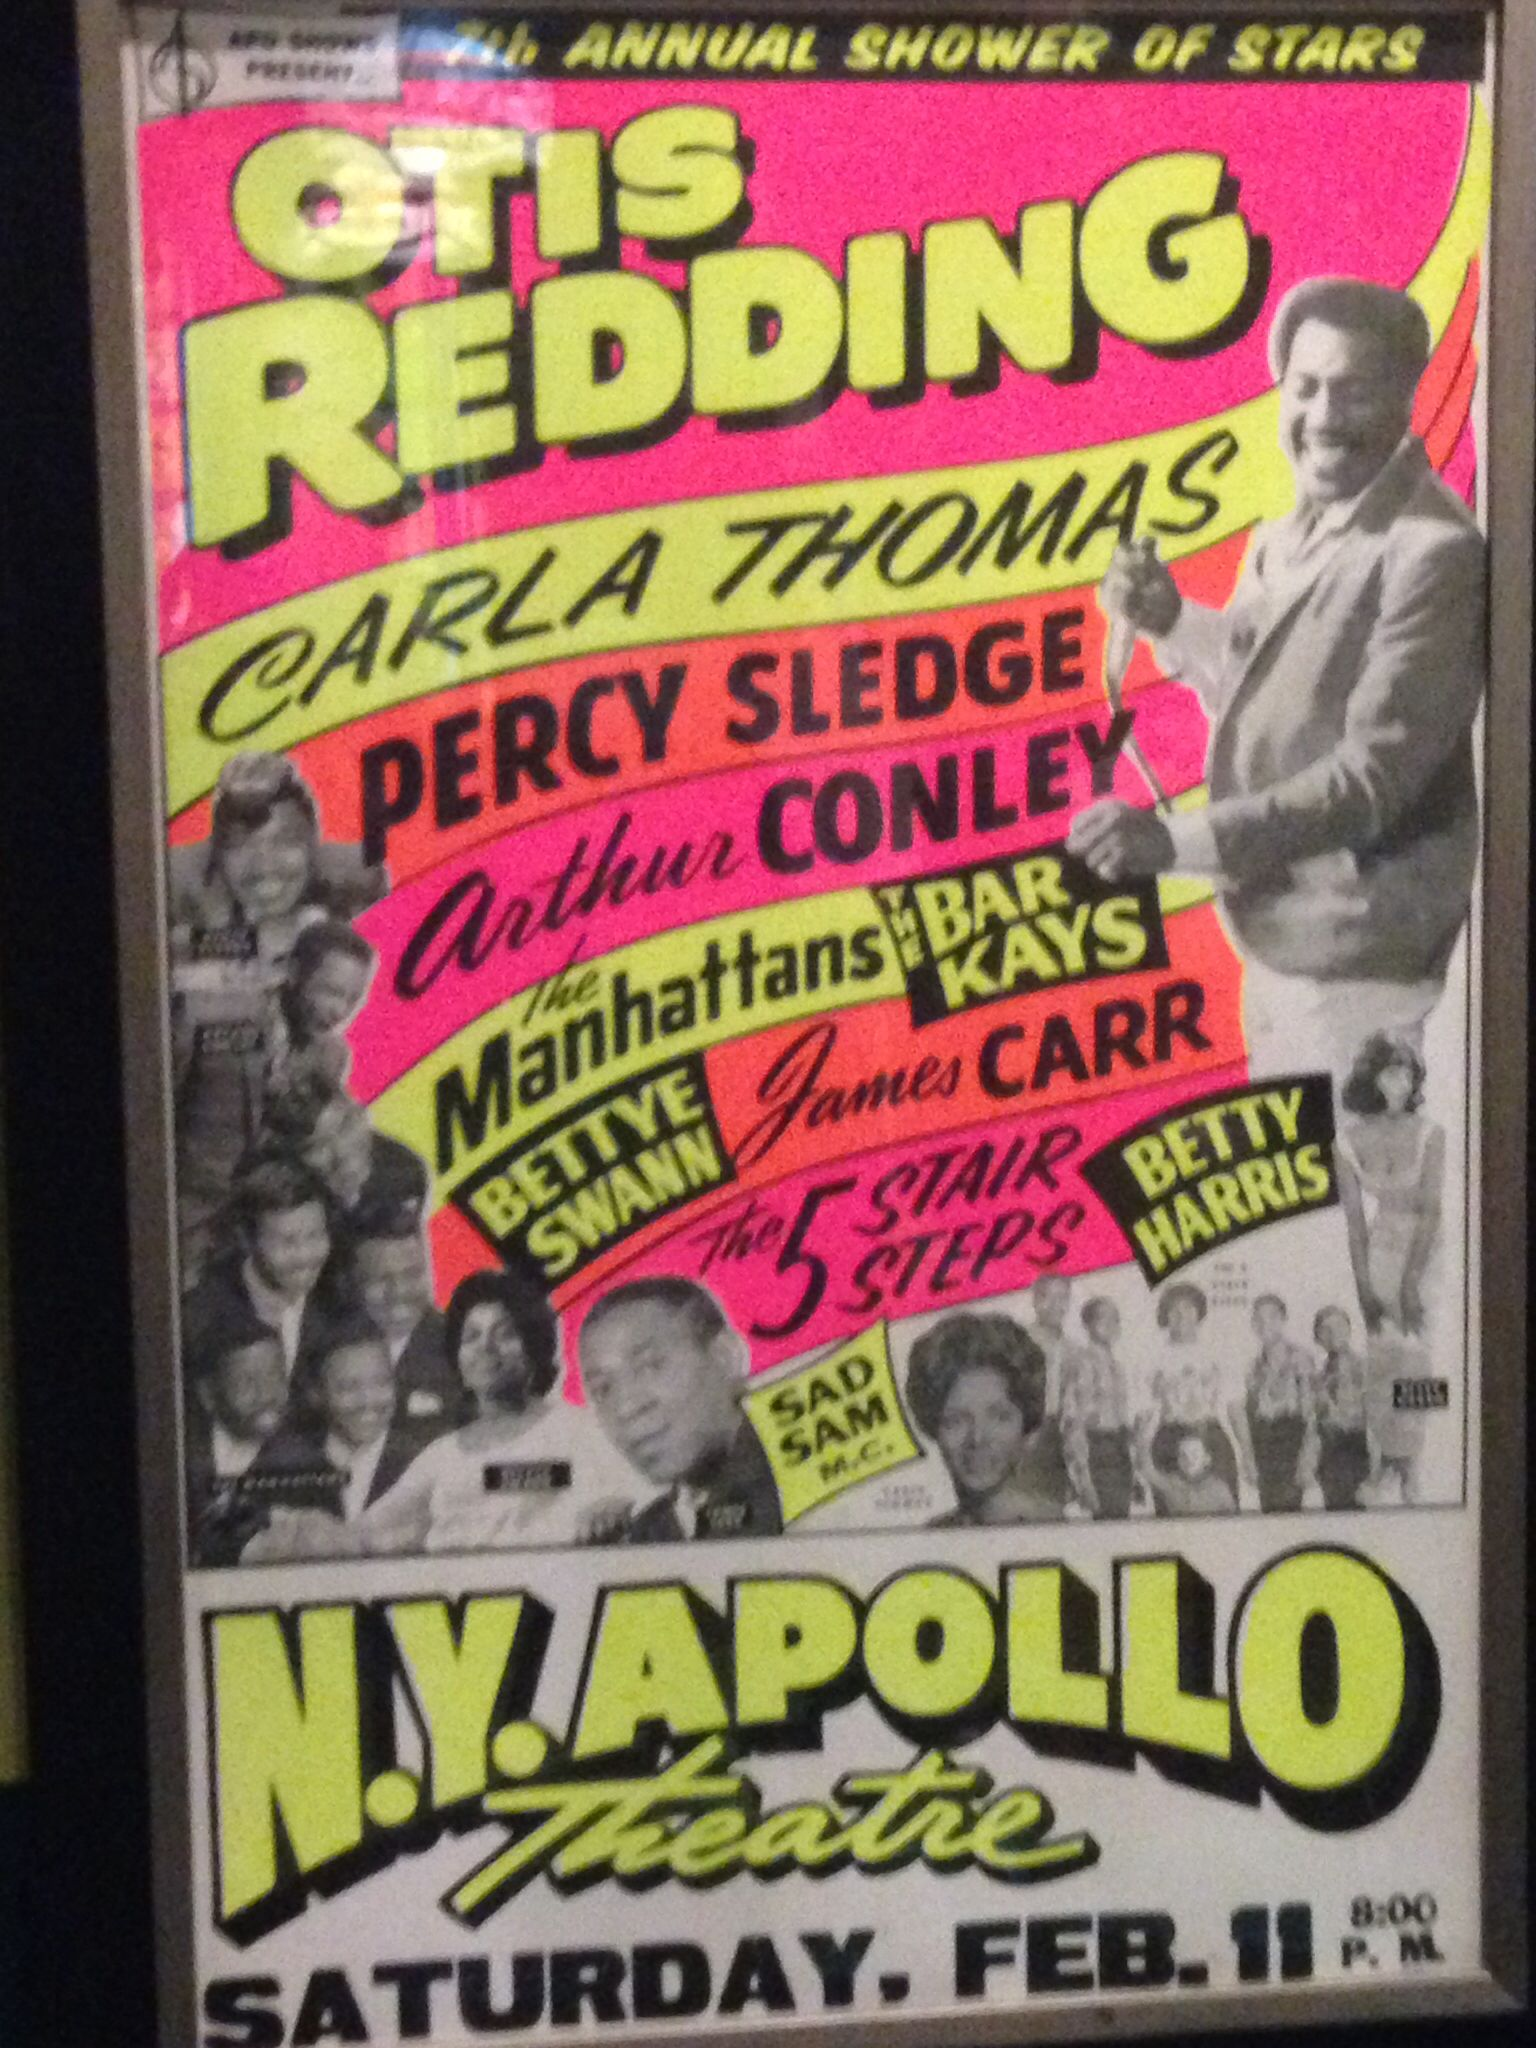 Otis Redding The Marvelettes 1967 Vintage Knoxville Poster Print Art A3 SIZE